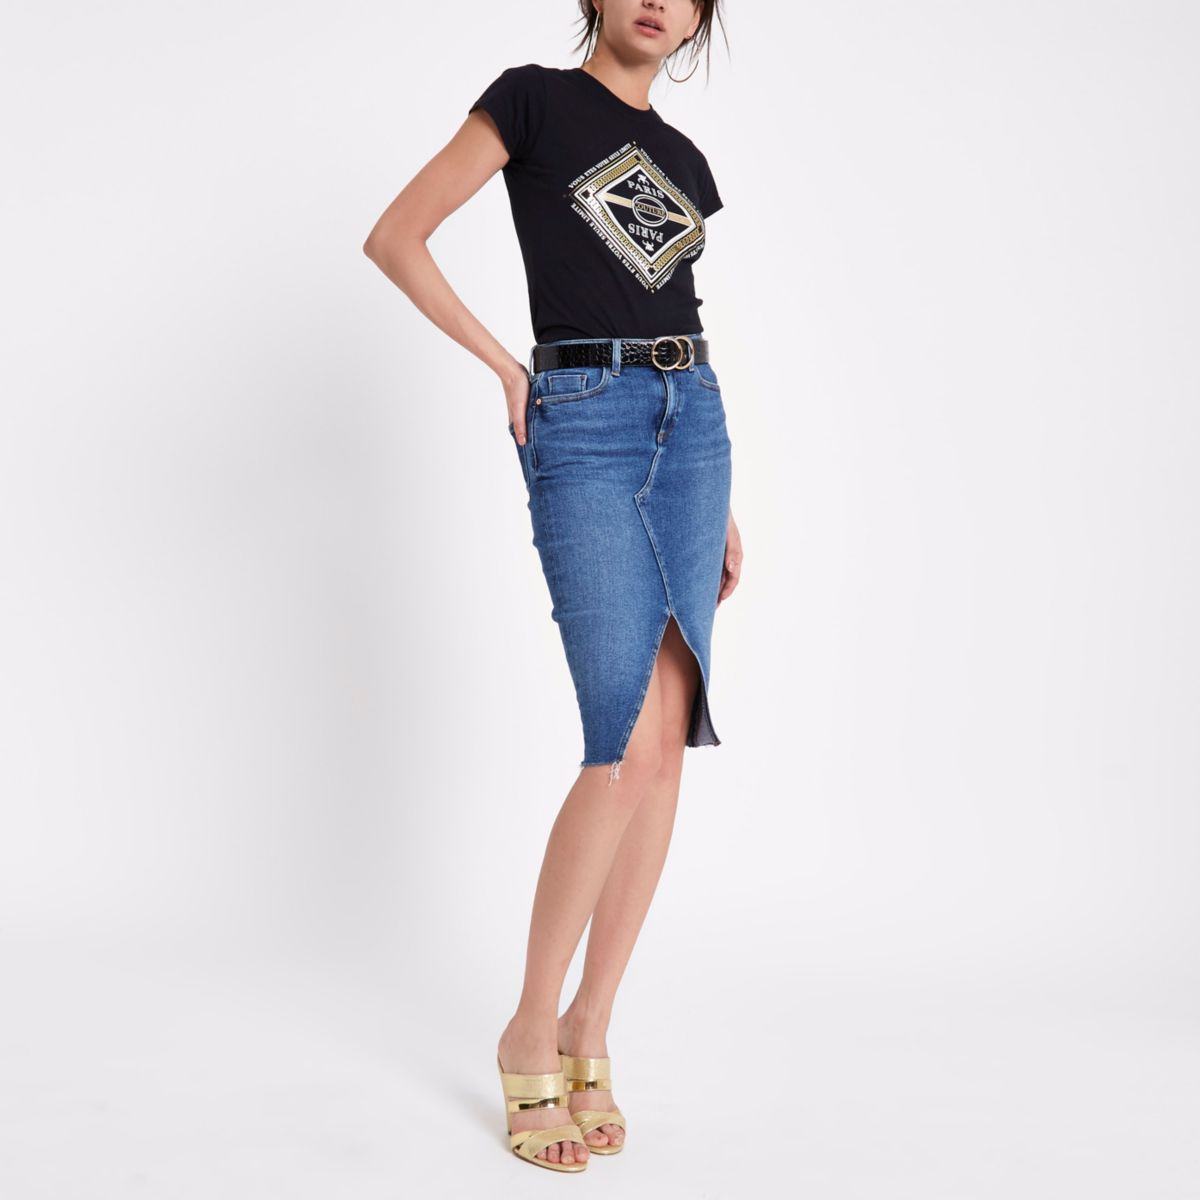 Black Paris diamond print T-shirt